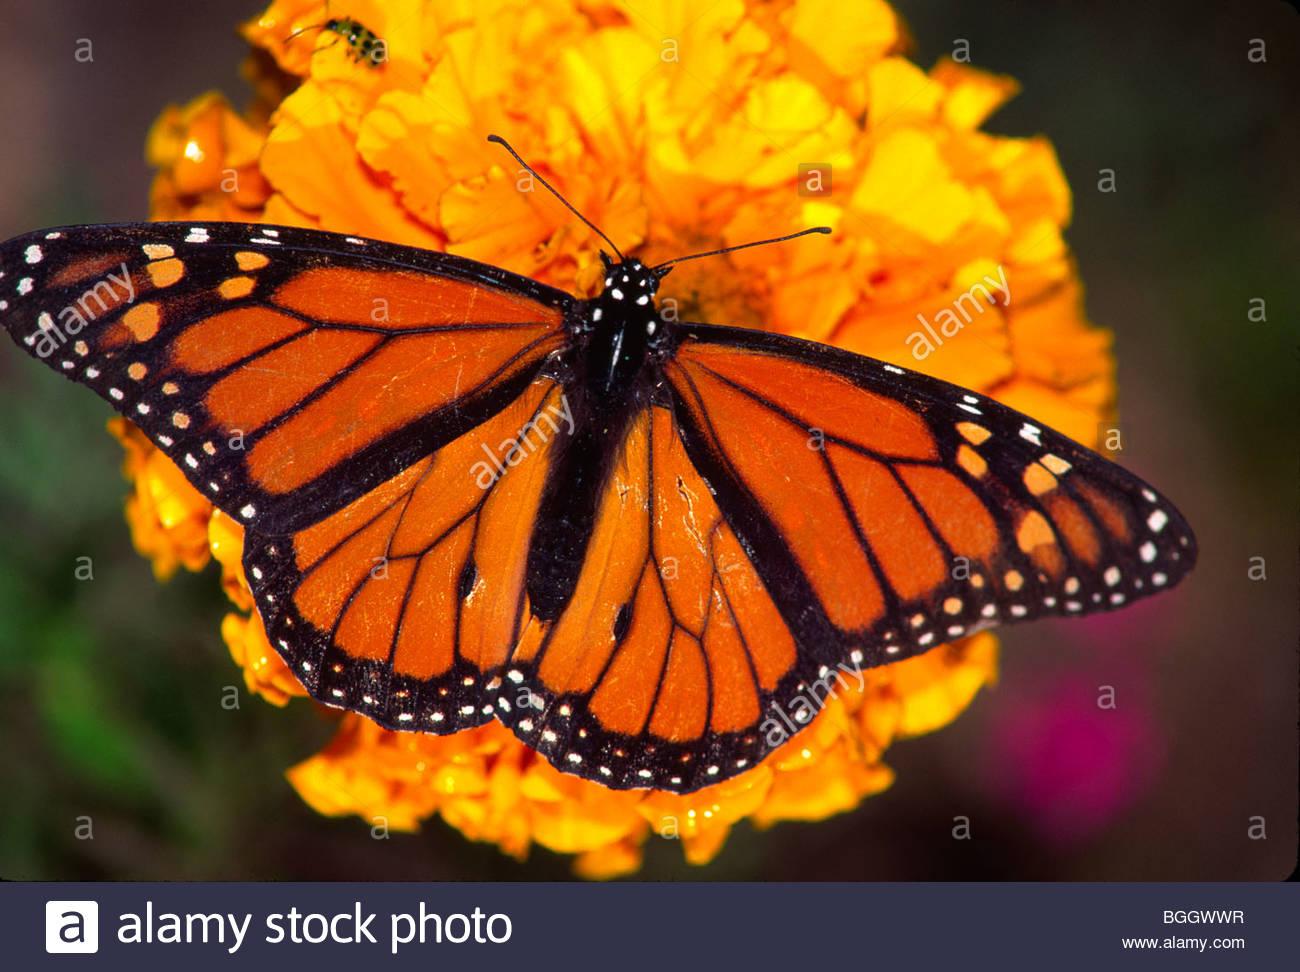 7e21639c5 Alaska. Monarch Butterfly on a marigold flower Stock Photo: 27416419 ...